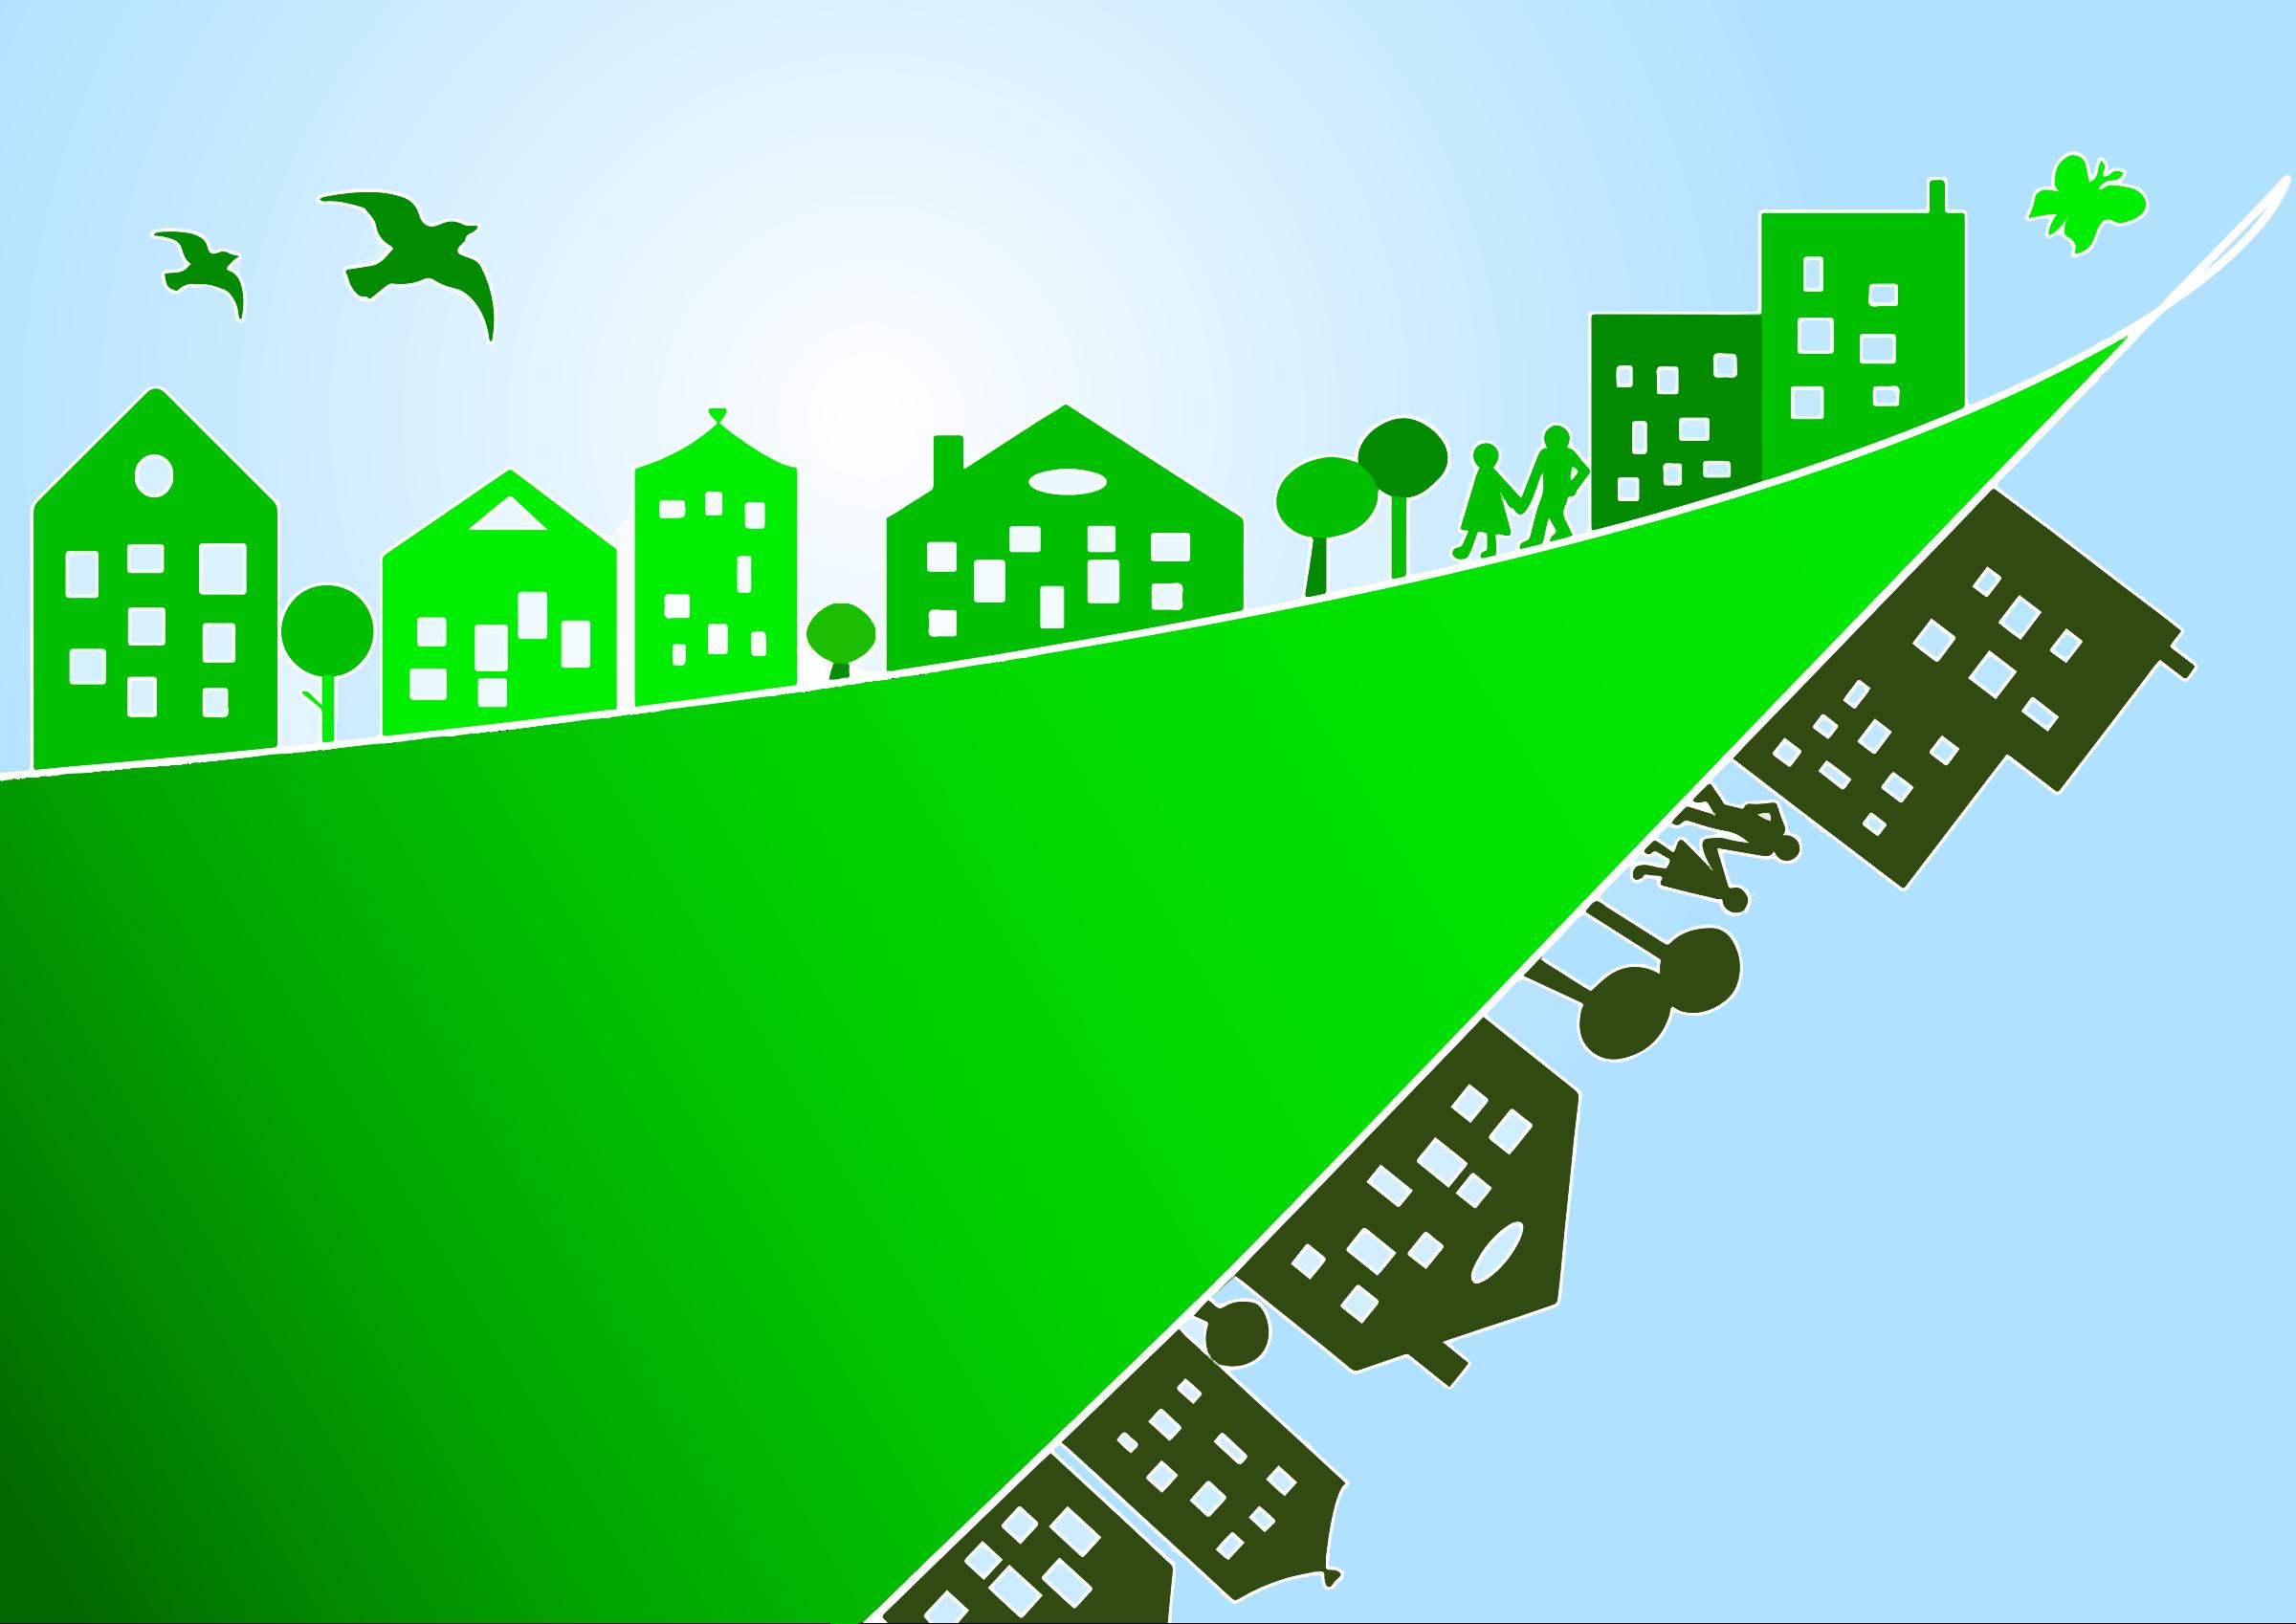 Environmental awareness clip art clip free download Clipart - Environmental Awareness clip free download